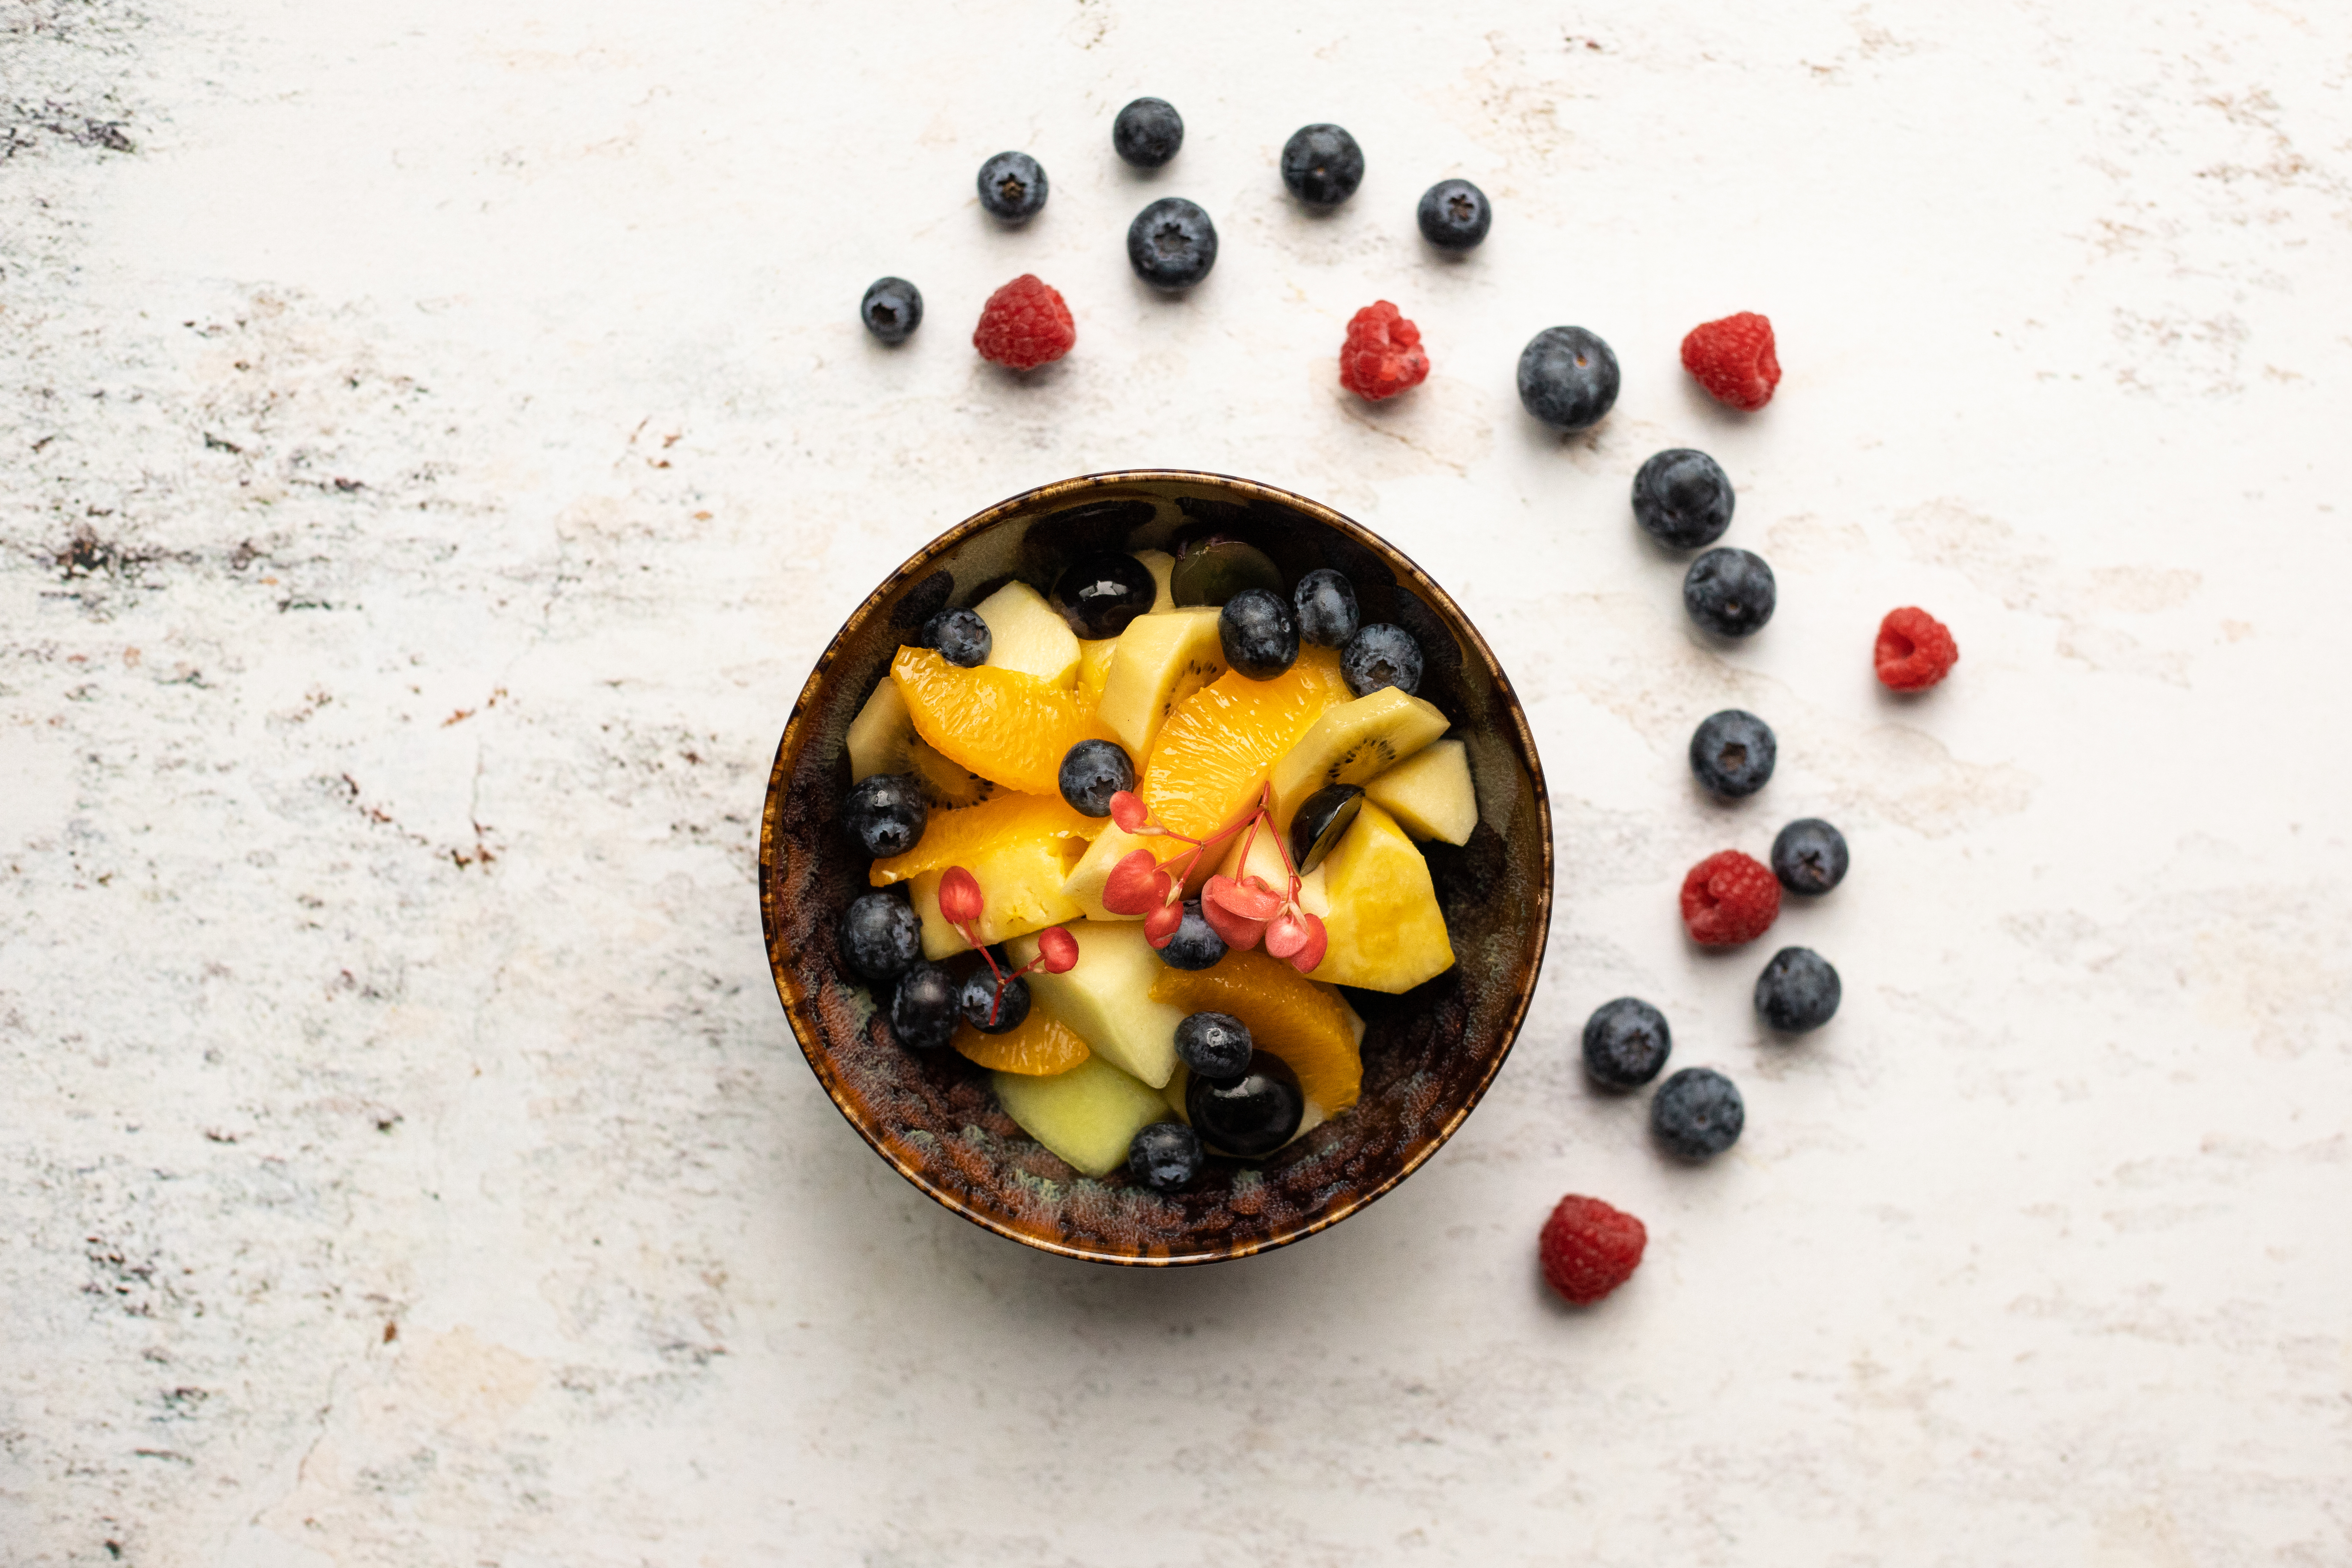 Vers gesneden fruitsalade